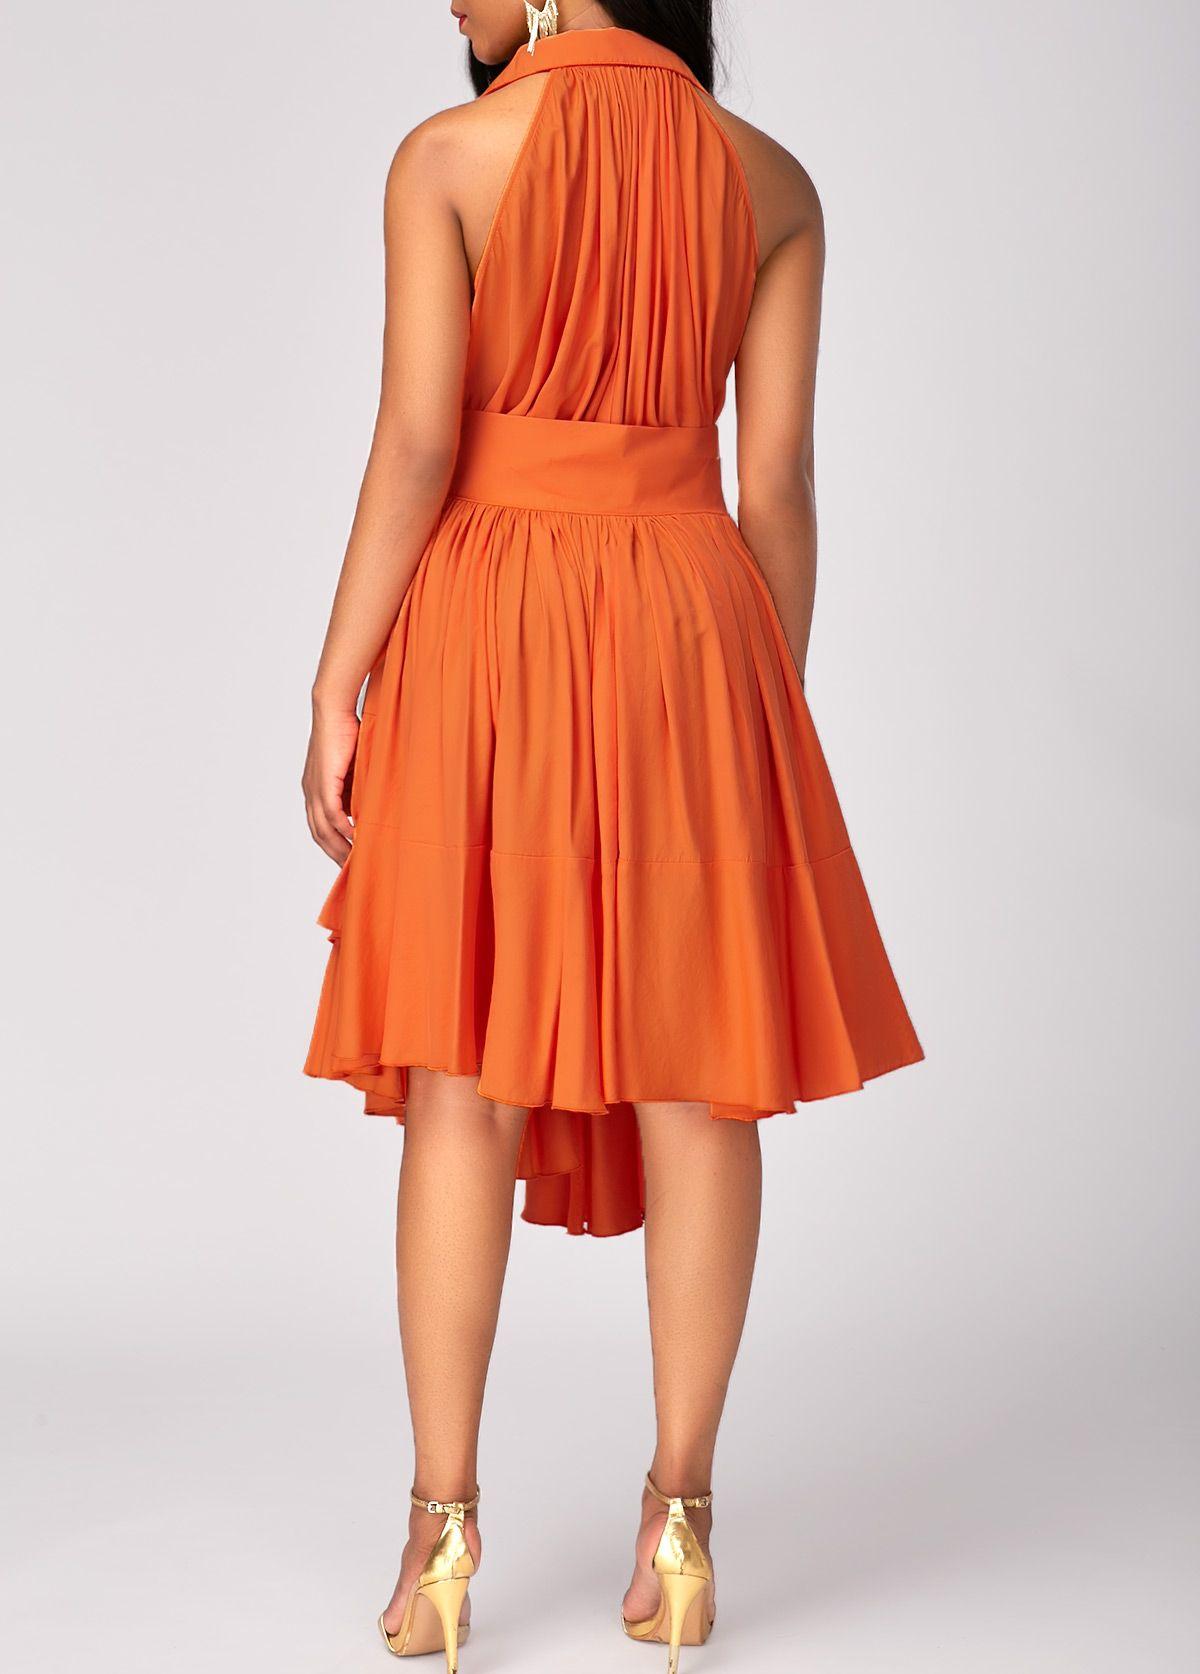 Asymmetric Hem High Waist Layered Orange Dress Rotita Com Usd 30 58 Orange Dress Stunning Dresses Dresses [ 1674 x 1200 Pixel ]